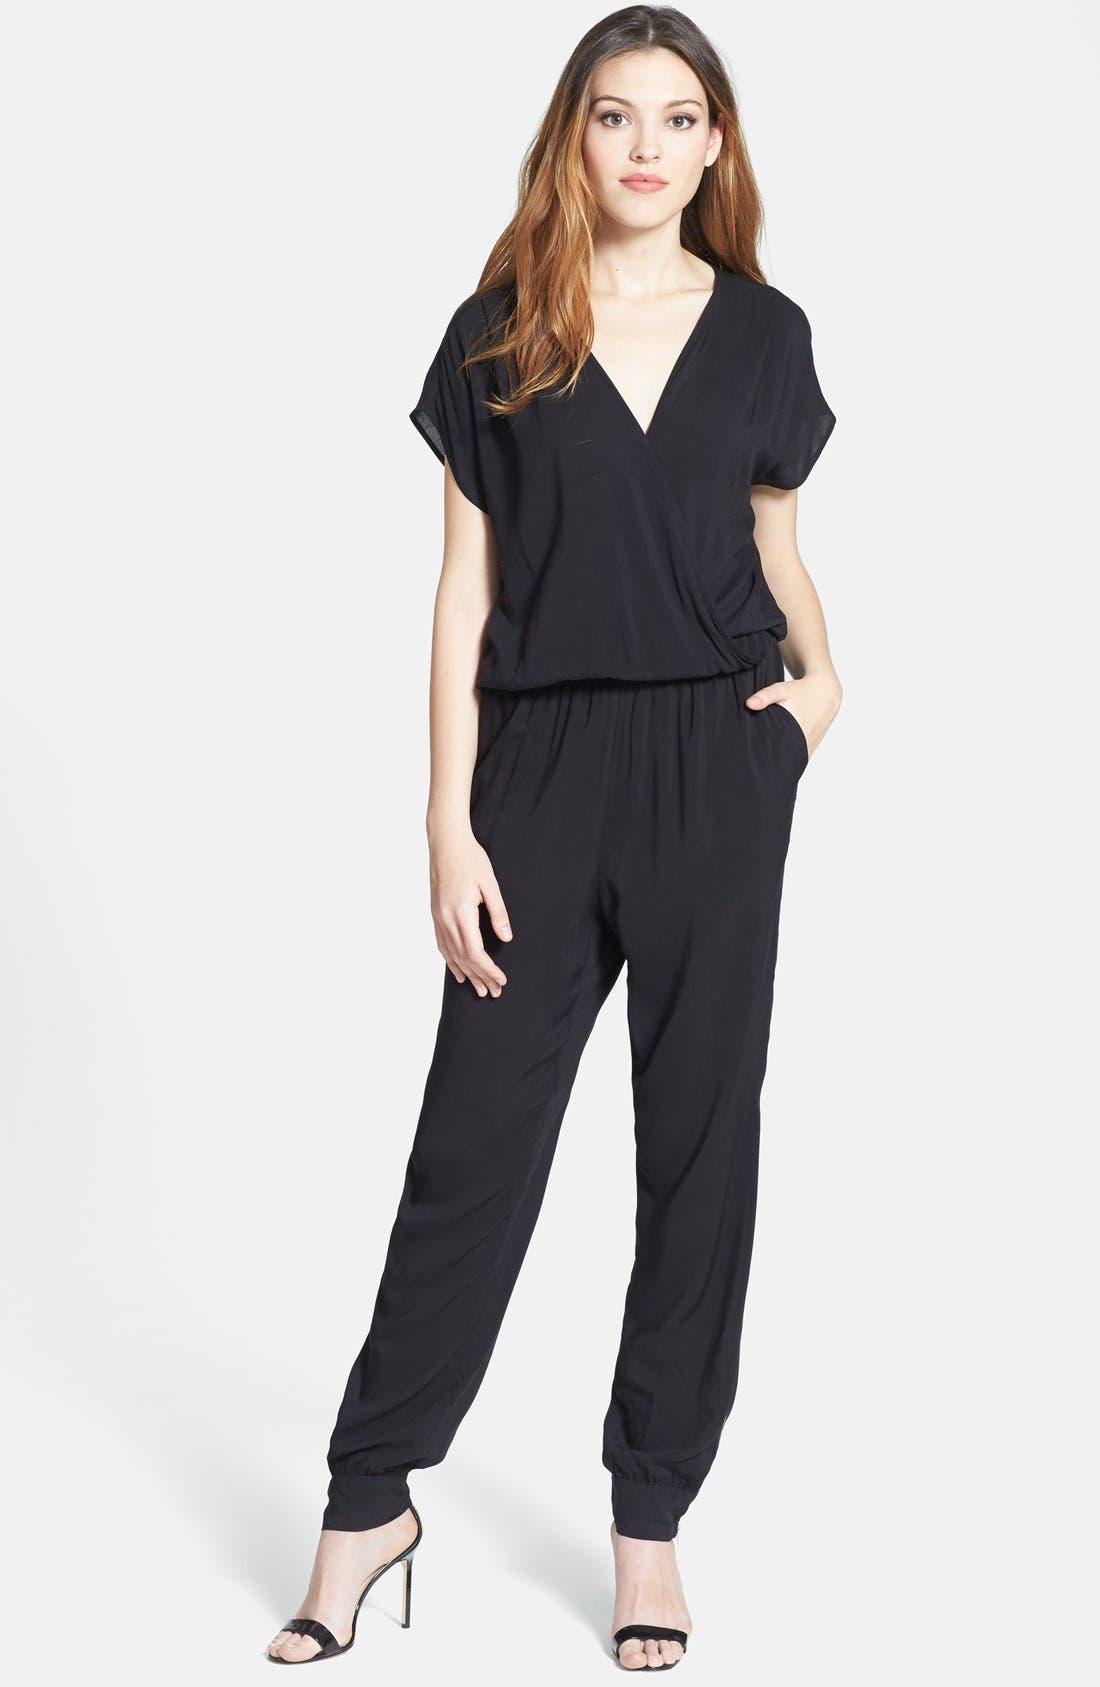 Main Image - Olivia Moon Wrap Top Jumpsuit (Regular & Petite)